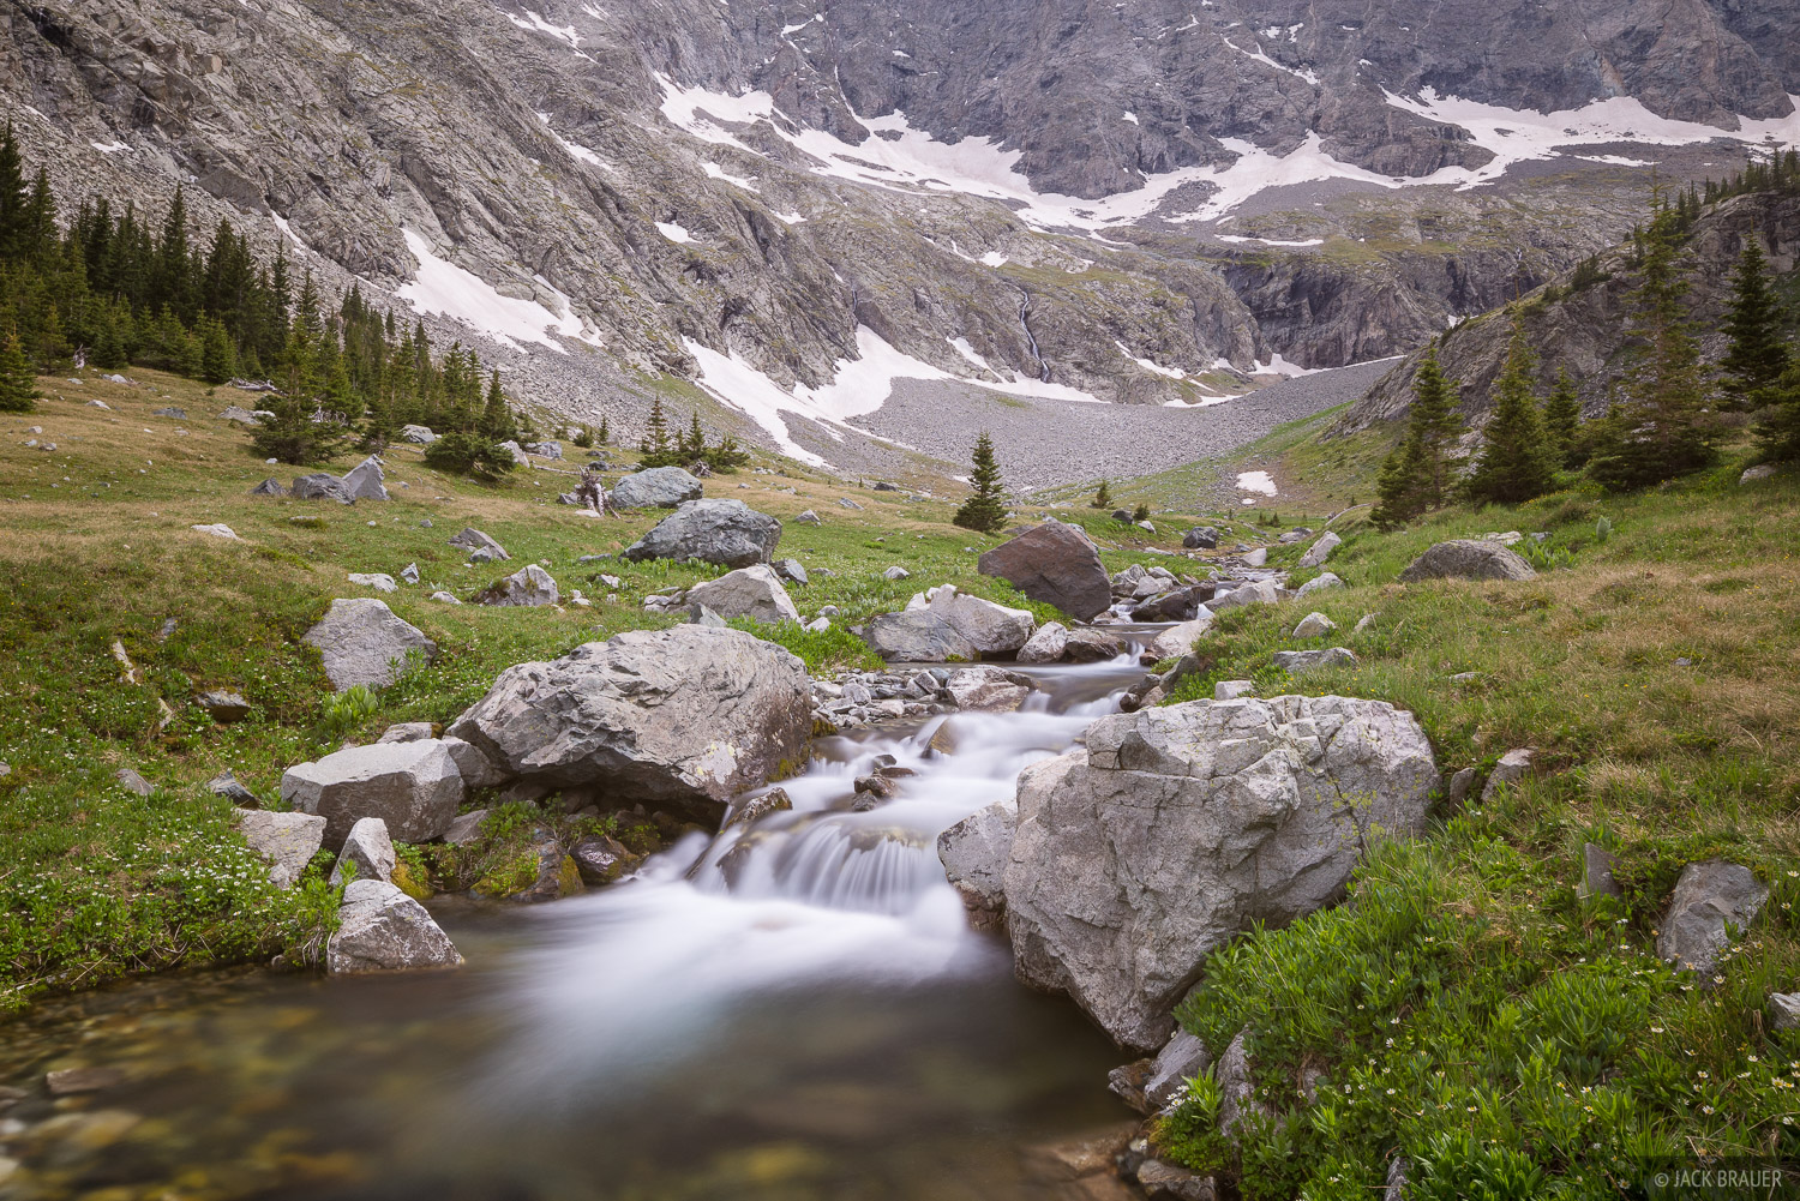 Colorado,Sangre de Cristos, Huerfano, Blanca Peak, photo